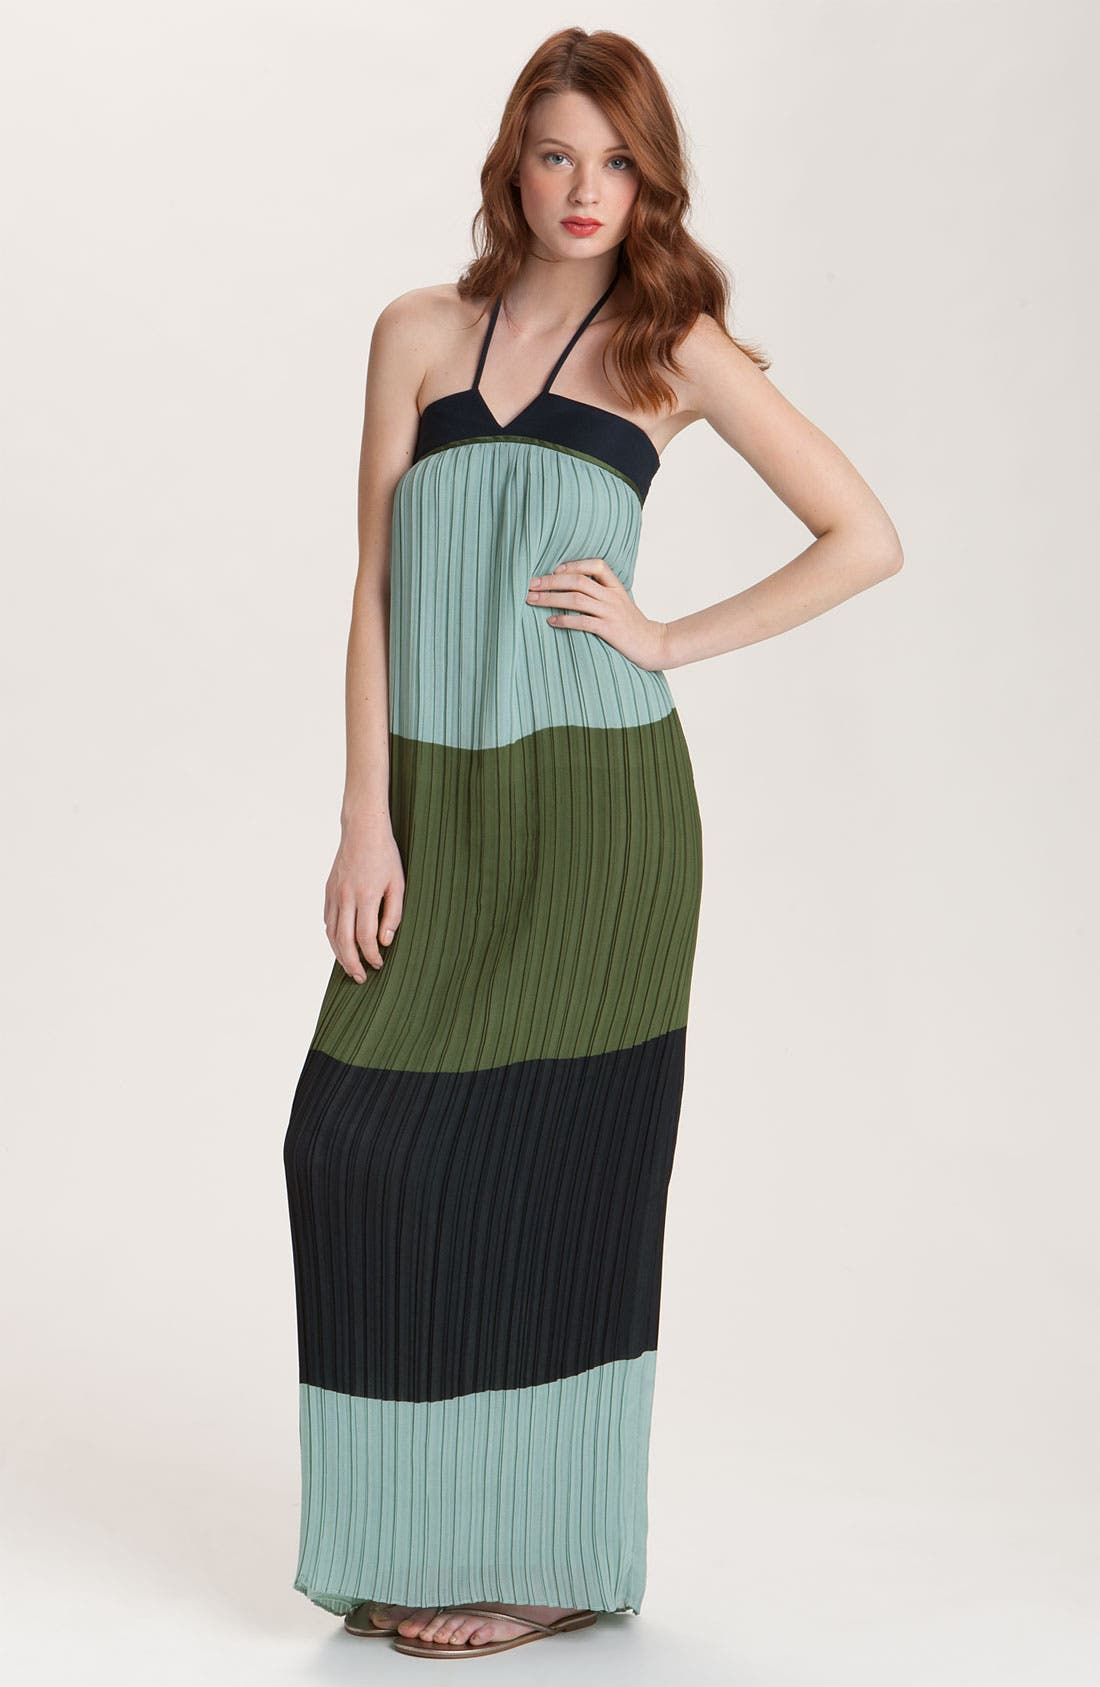 Main Image - Derek Lam 10 Crosby Pleated Colorblock Halter Maxi Dress